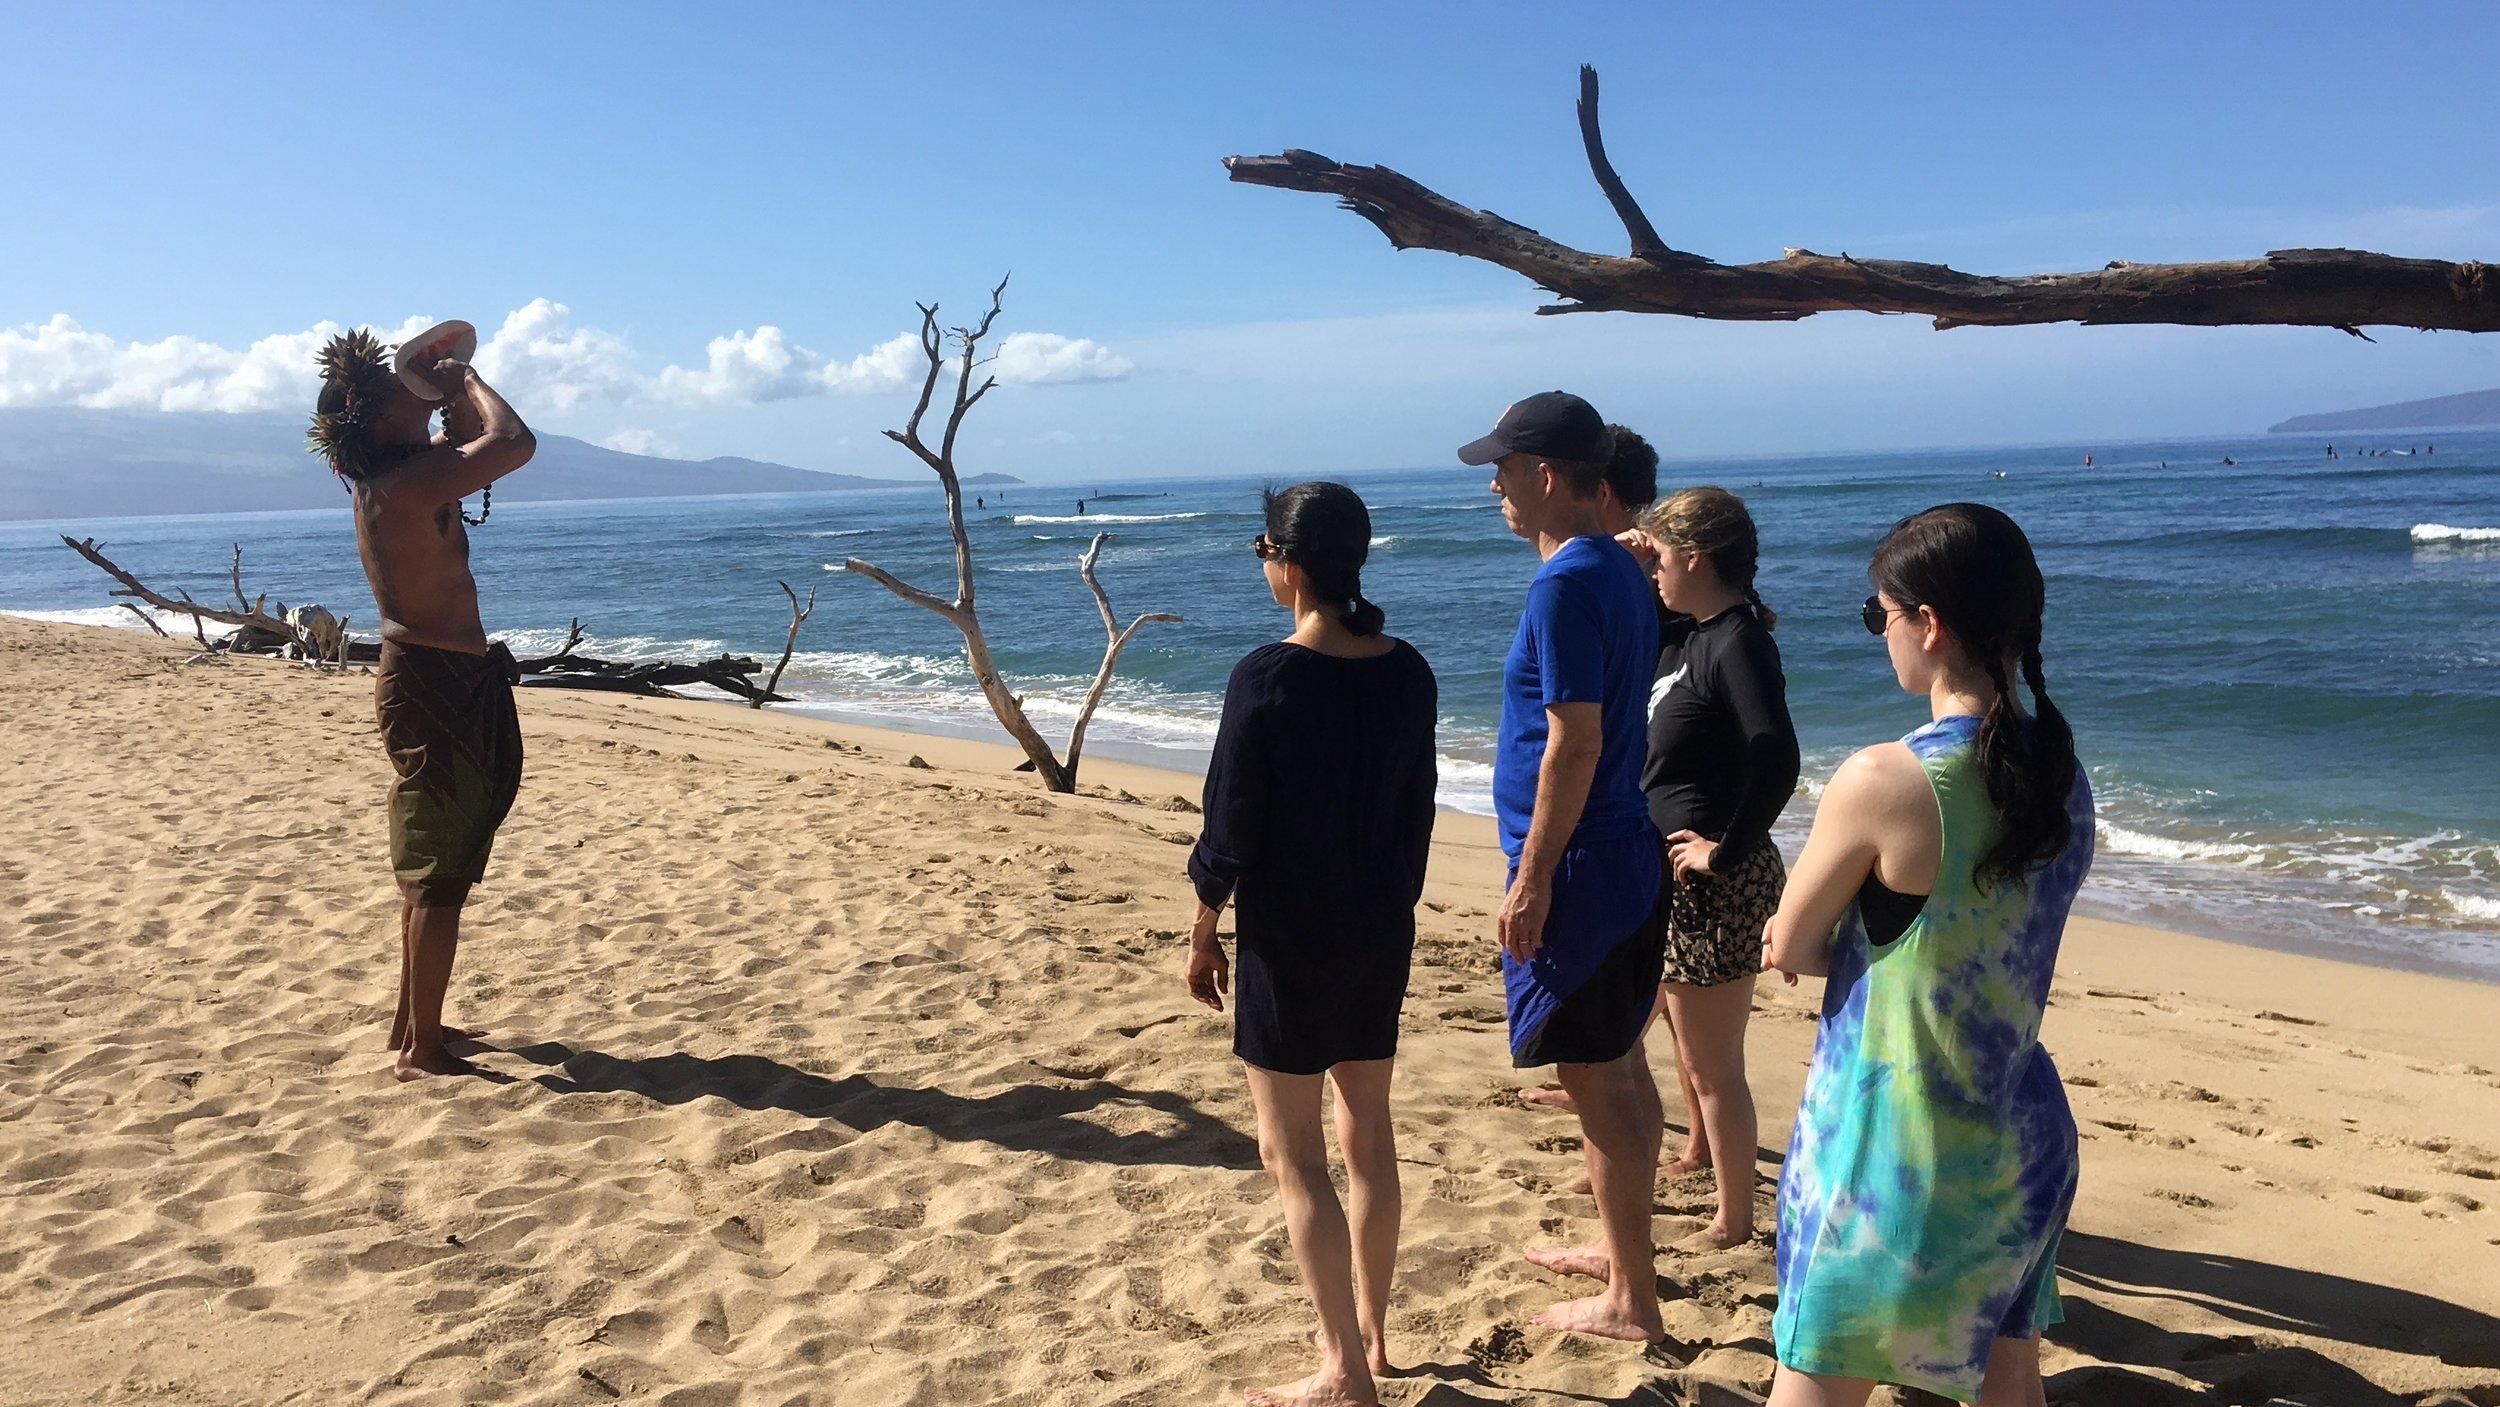 Blue_Soul_Maui_Hawaiian_Culture_2.jpg